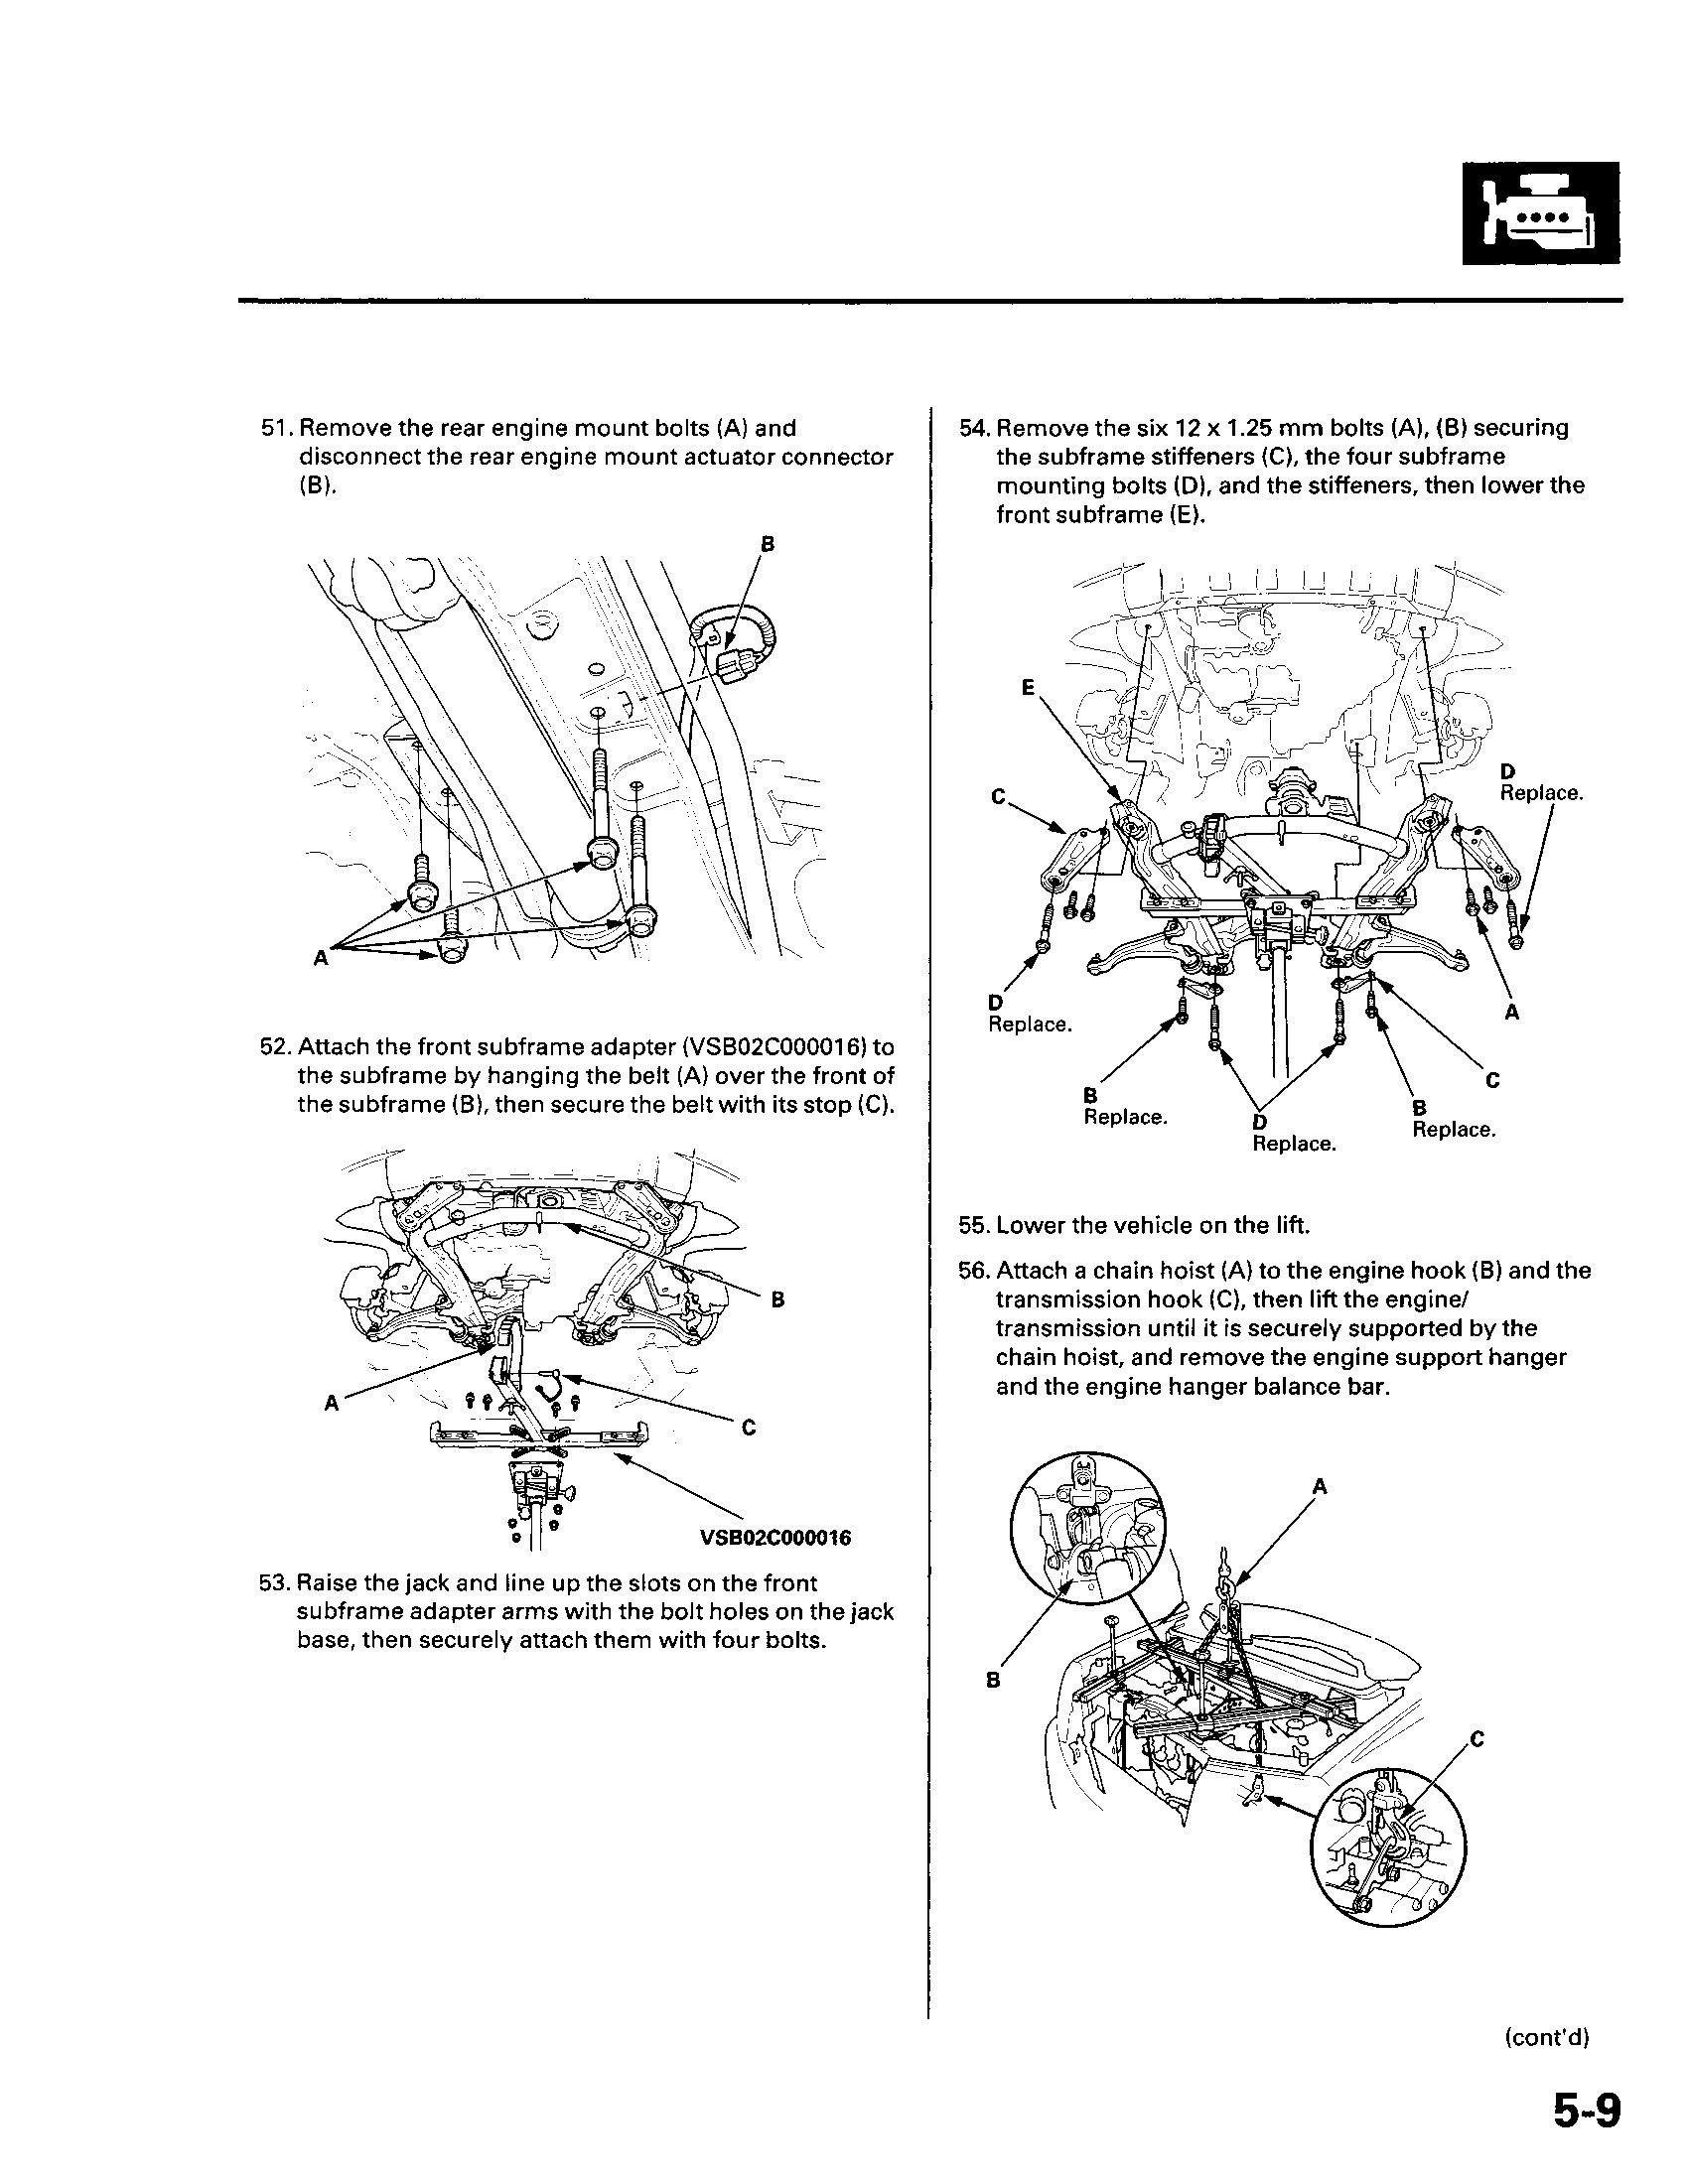 2003 Honda Civic Belt Diagram Vw Polo 1998 Radio Wiring Hub Bearing Replacement Imageresizertool Com